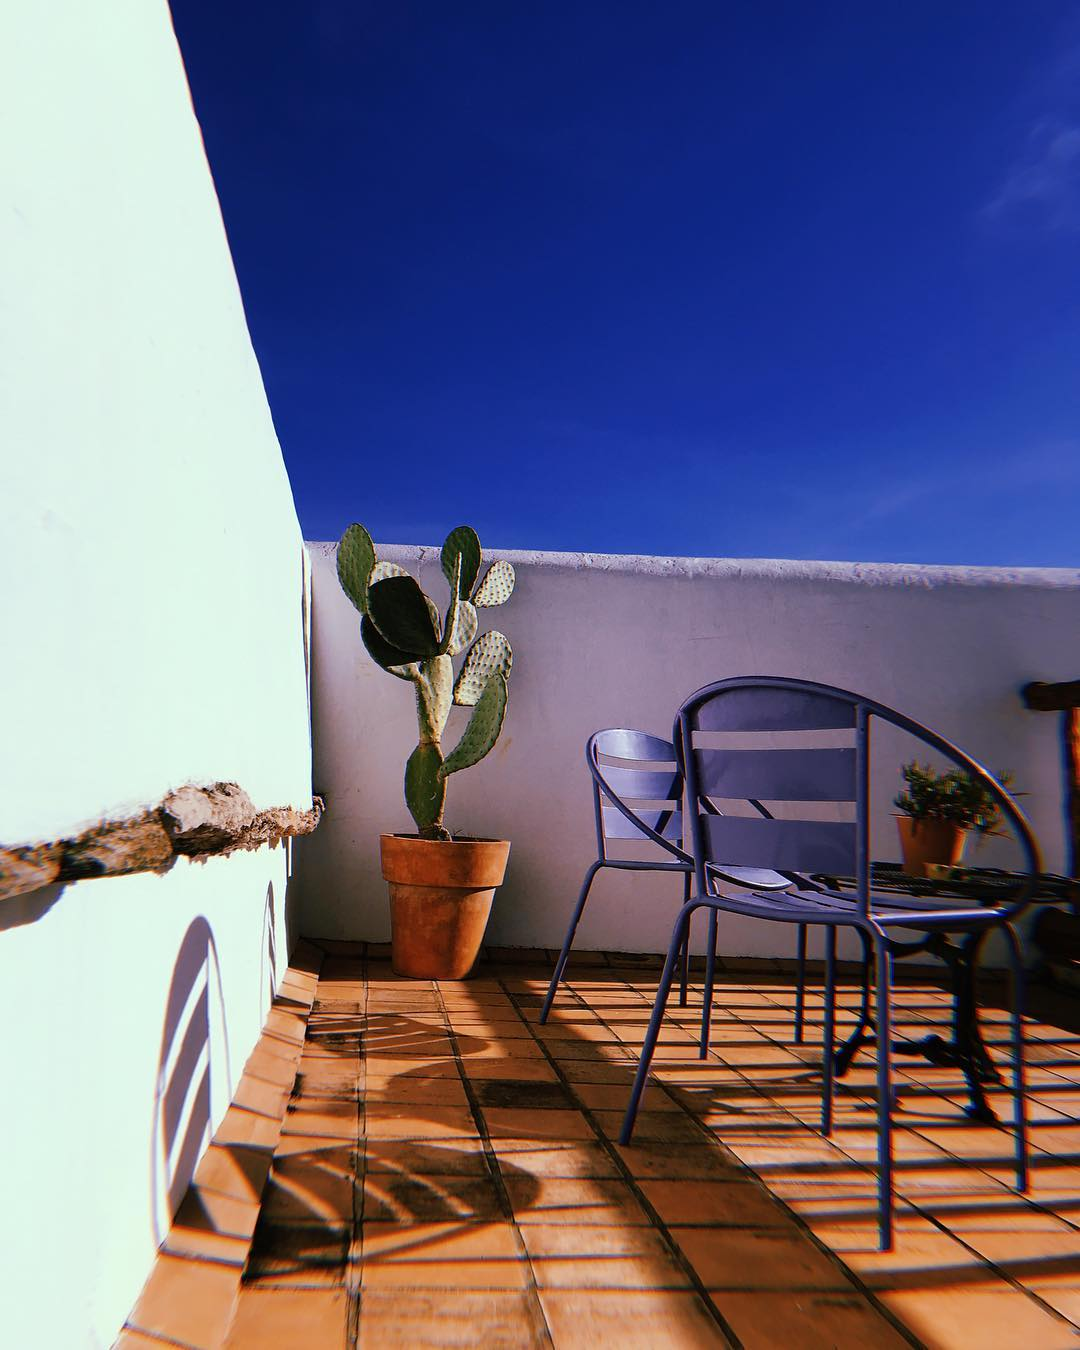 // It doesn't really feel like Xmas // #december #sun #deep #blue #sky #winterweather #ibizastyle #itsbetterinibiza #lascicadasibiza #welove #winterseason #islandlife #ibiza #vintagechairs #cactus